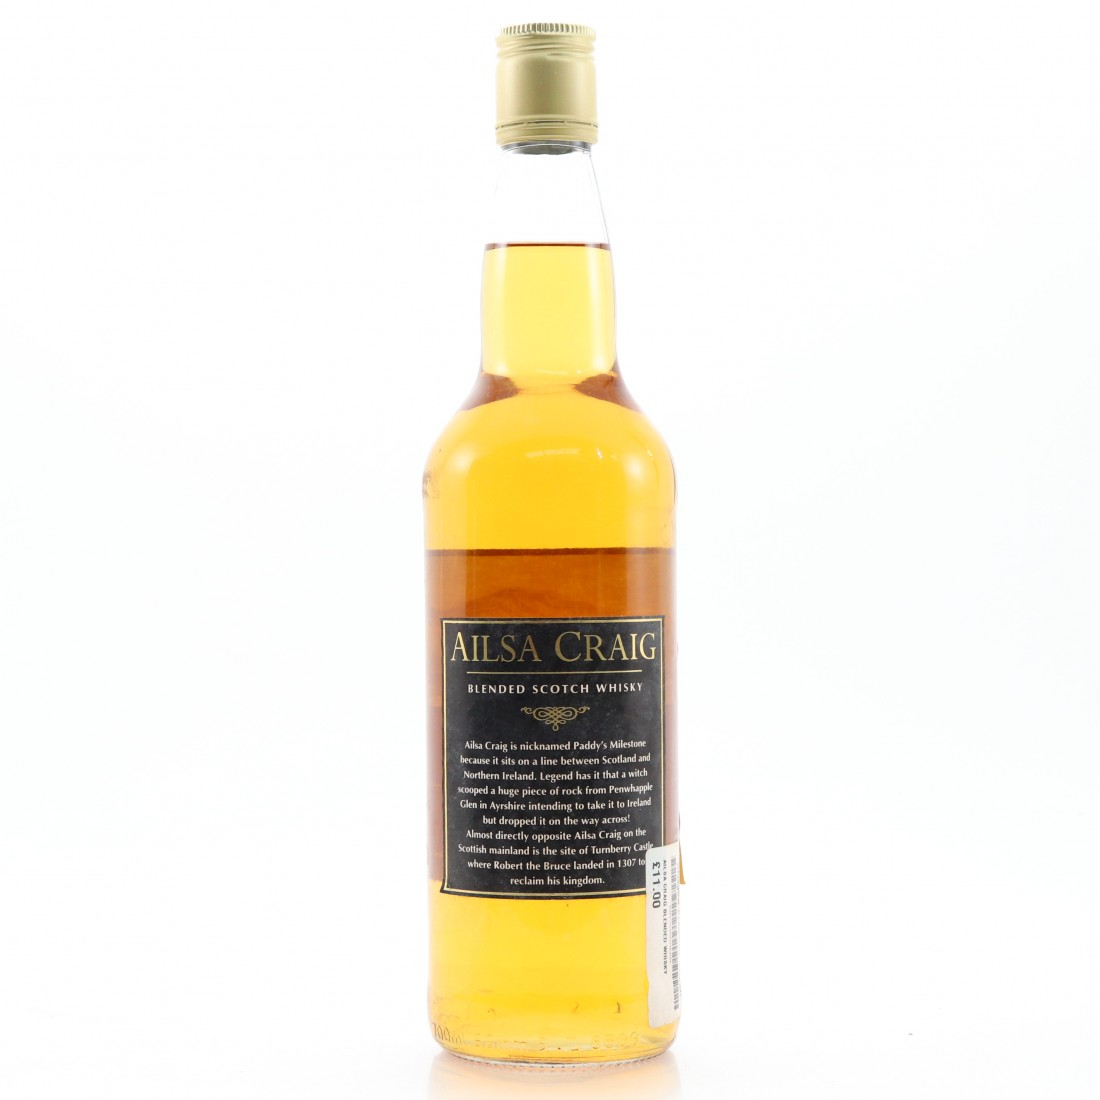 Ailsa Craig Blended Scotch Whisky